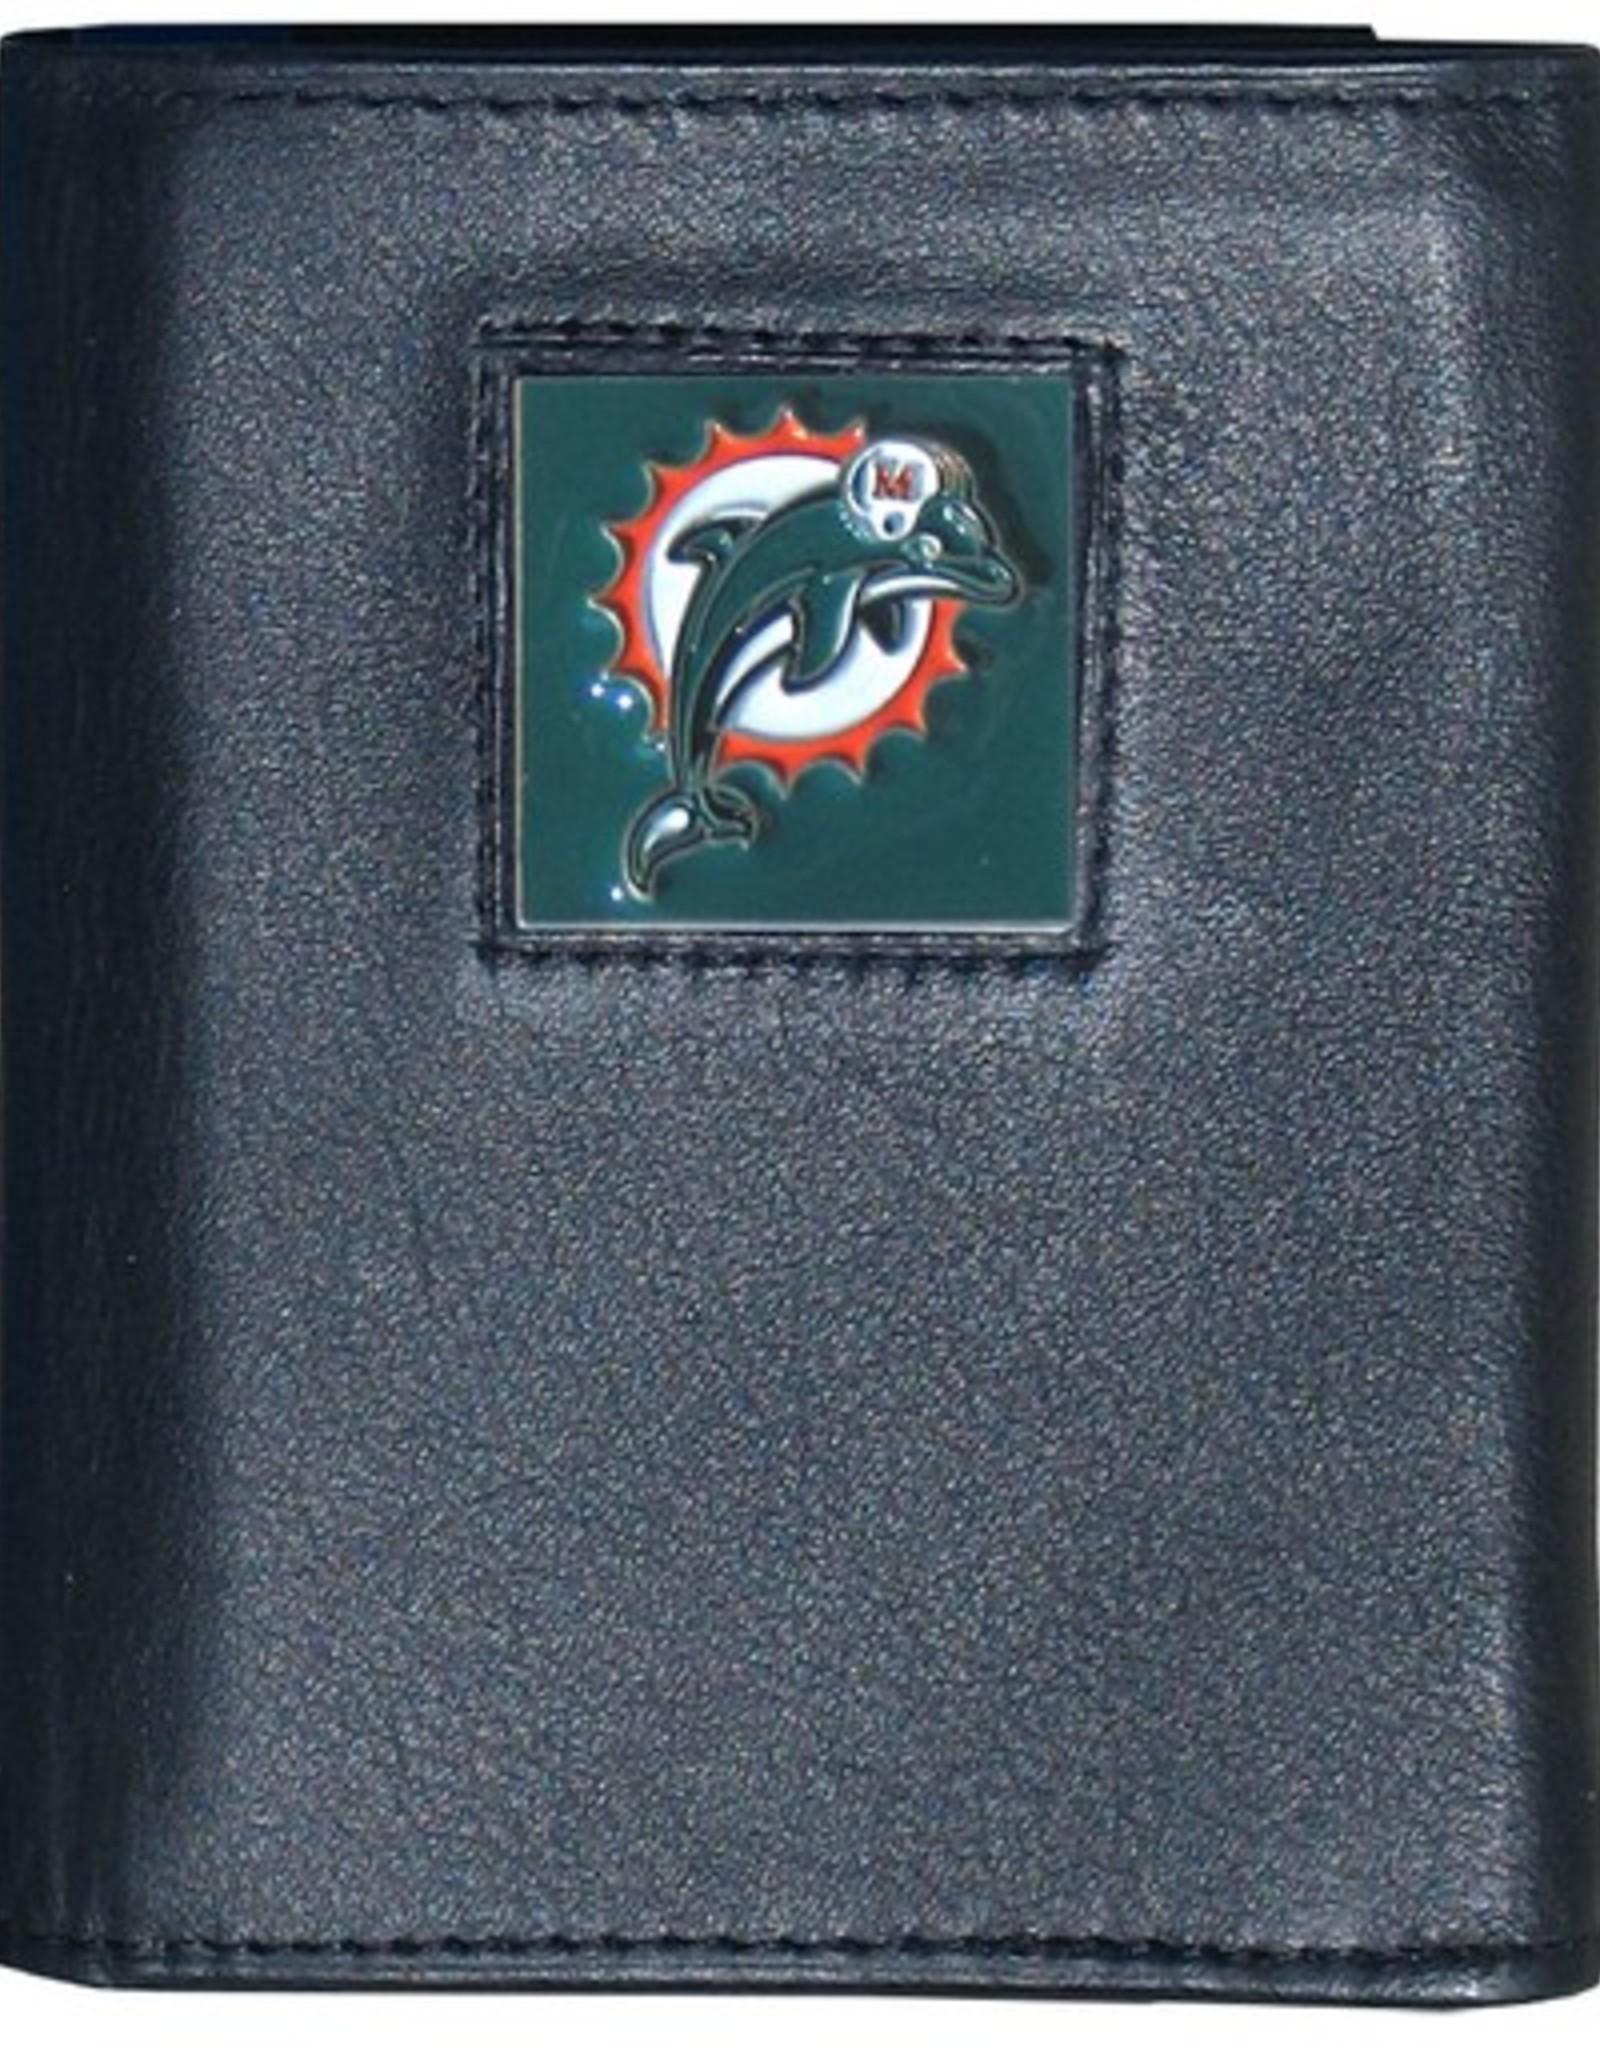 Miami Dolphins Executive Black Leather Trifold Wallet